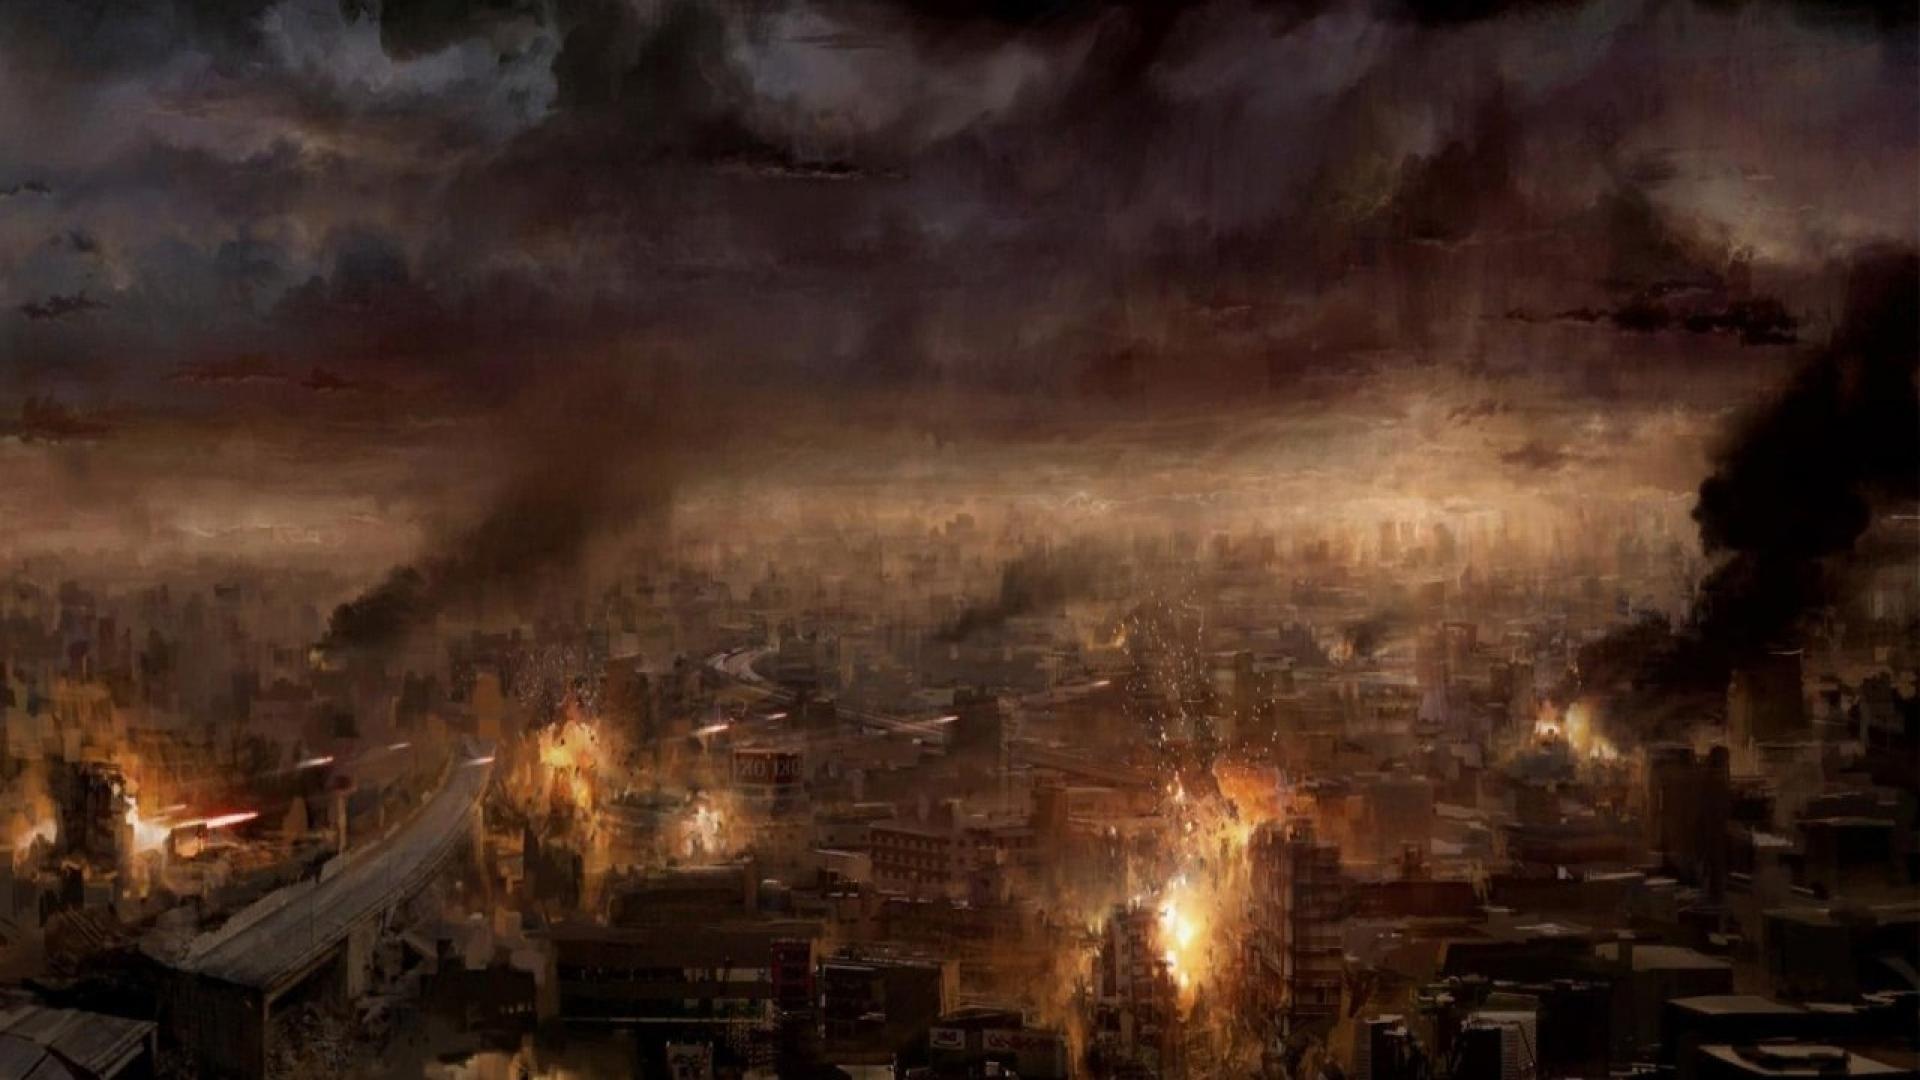 Cool Wallpaper Car Game Explostion Guns 1920x1080 Ruins Burning City Apocalypse Artwork Hd